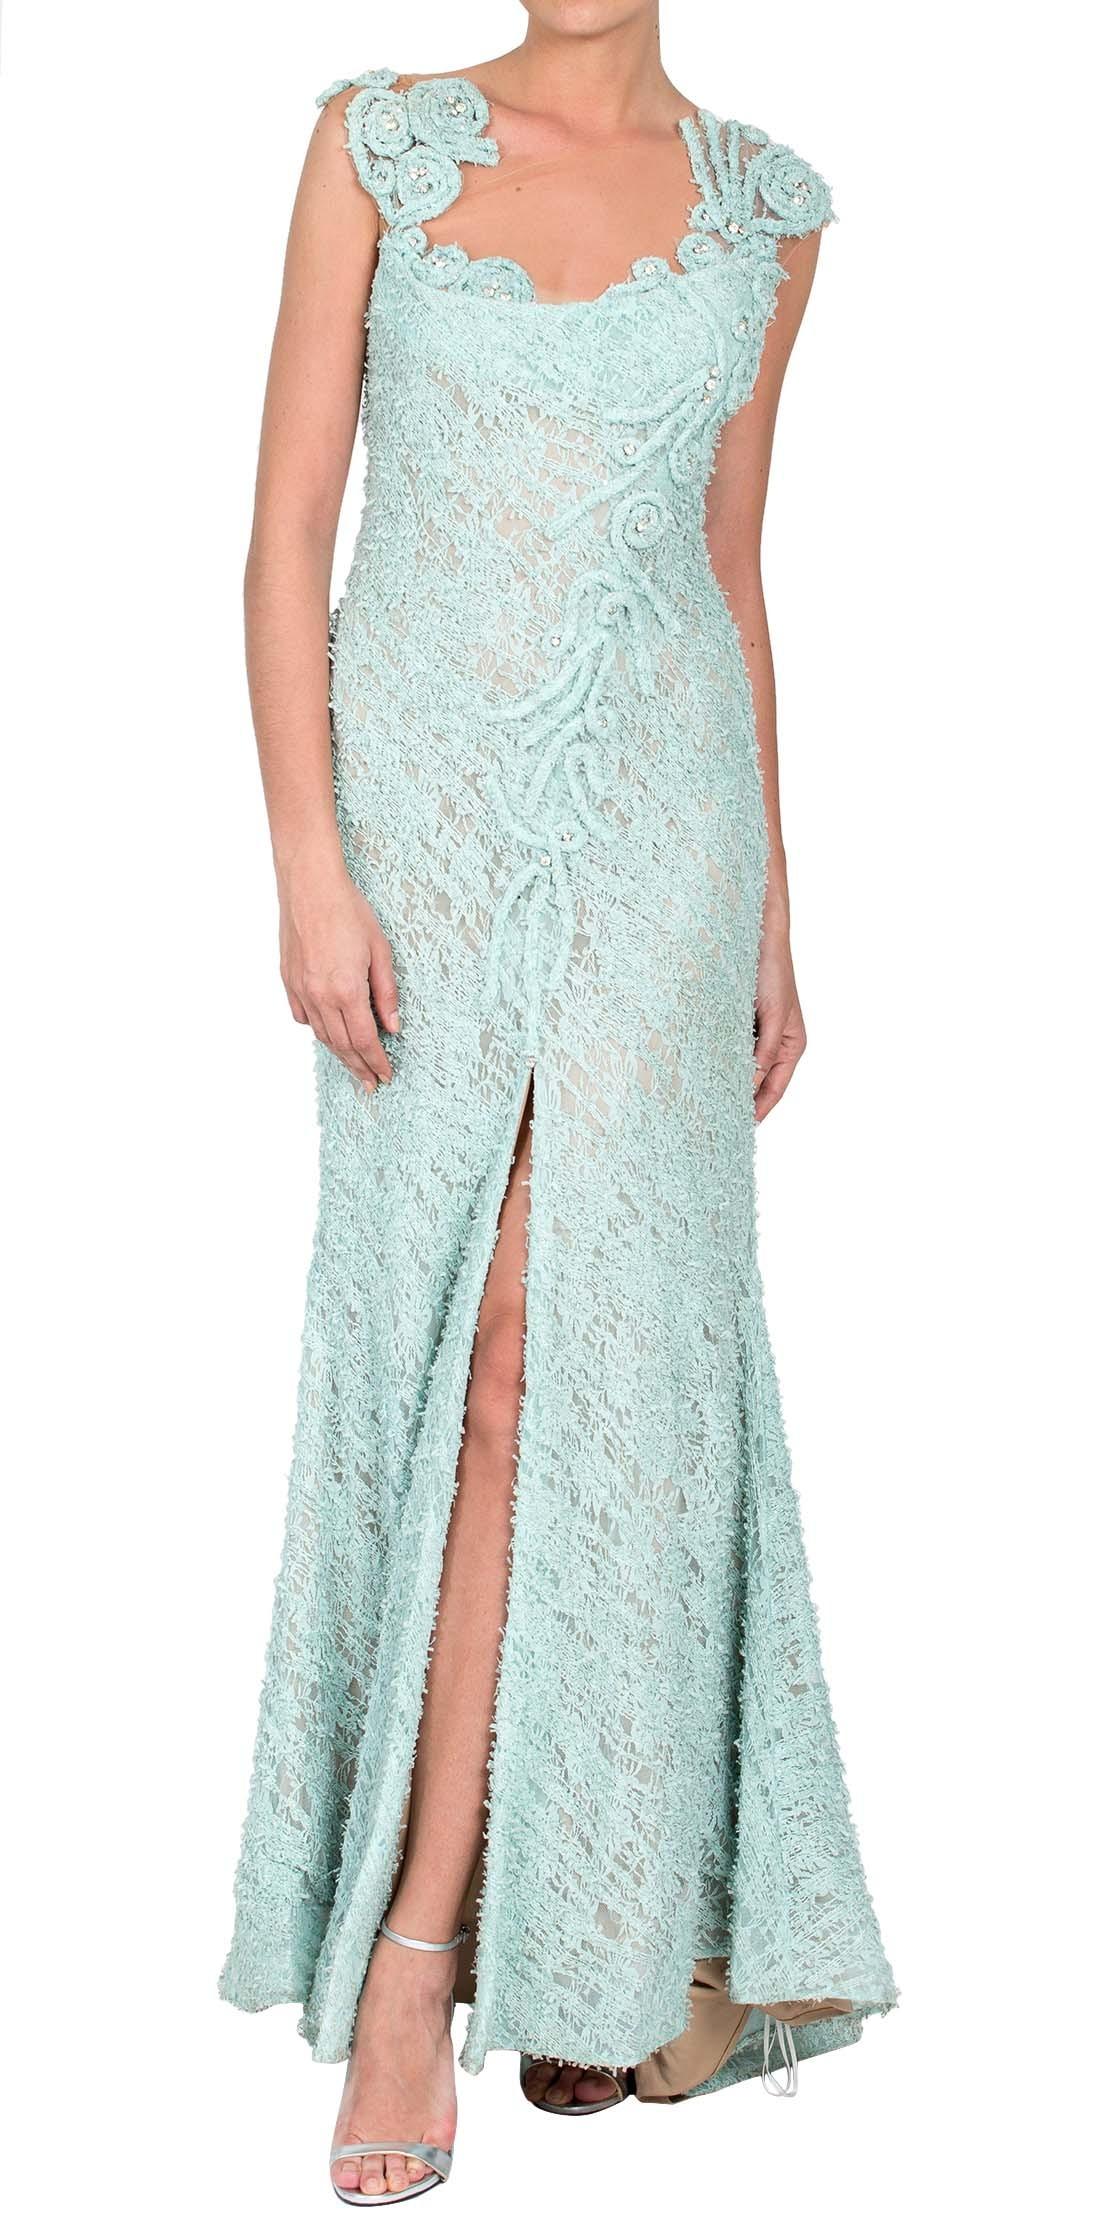 MNM Couture Lace Maxi Dress